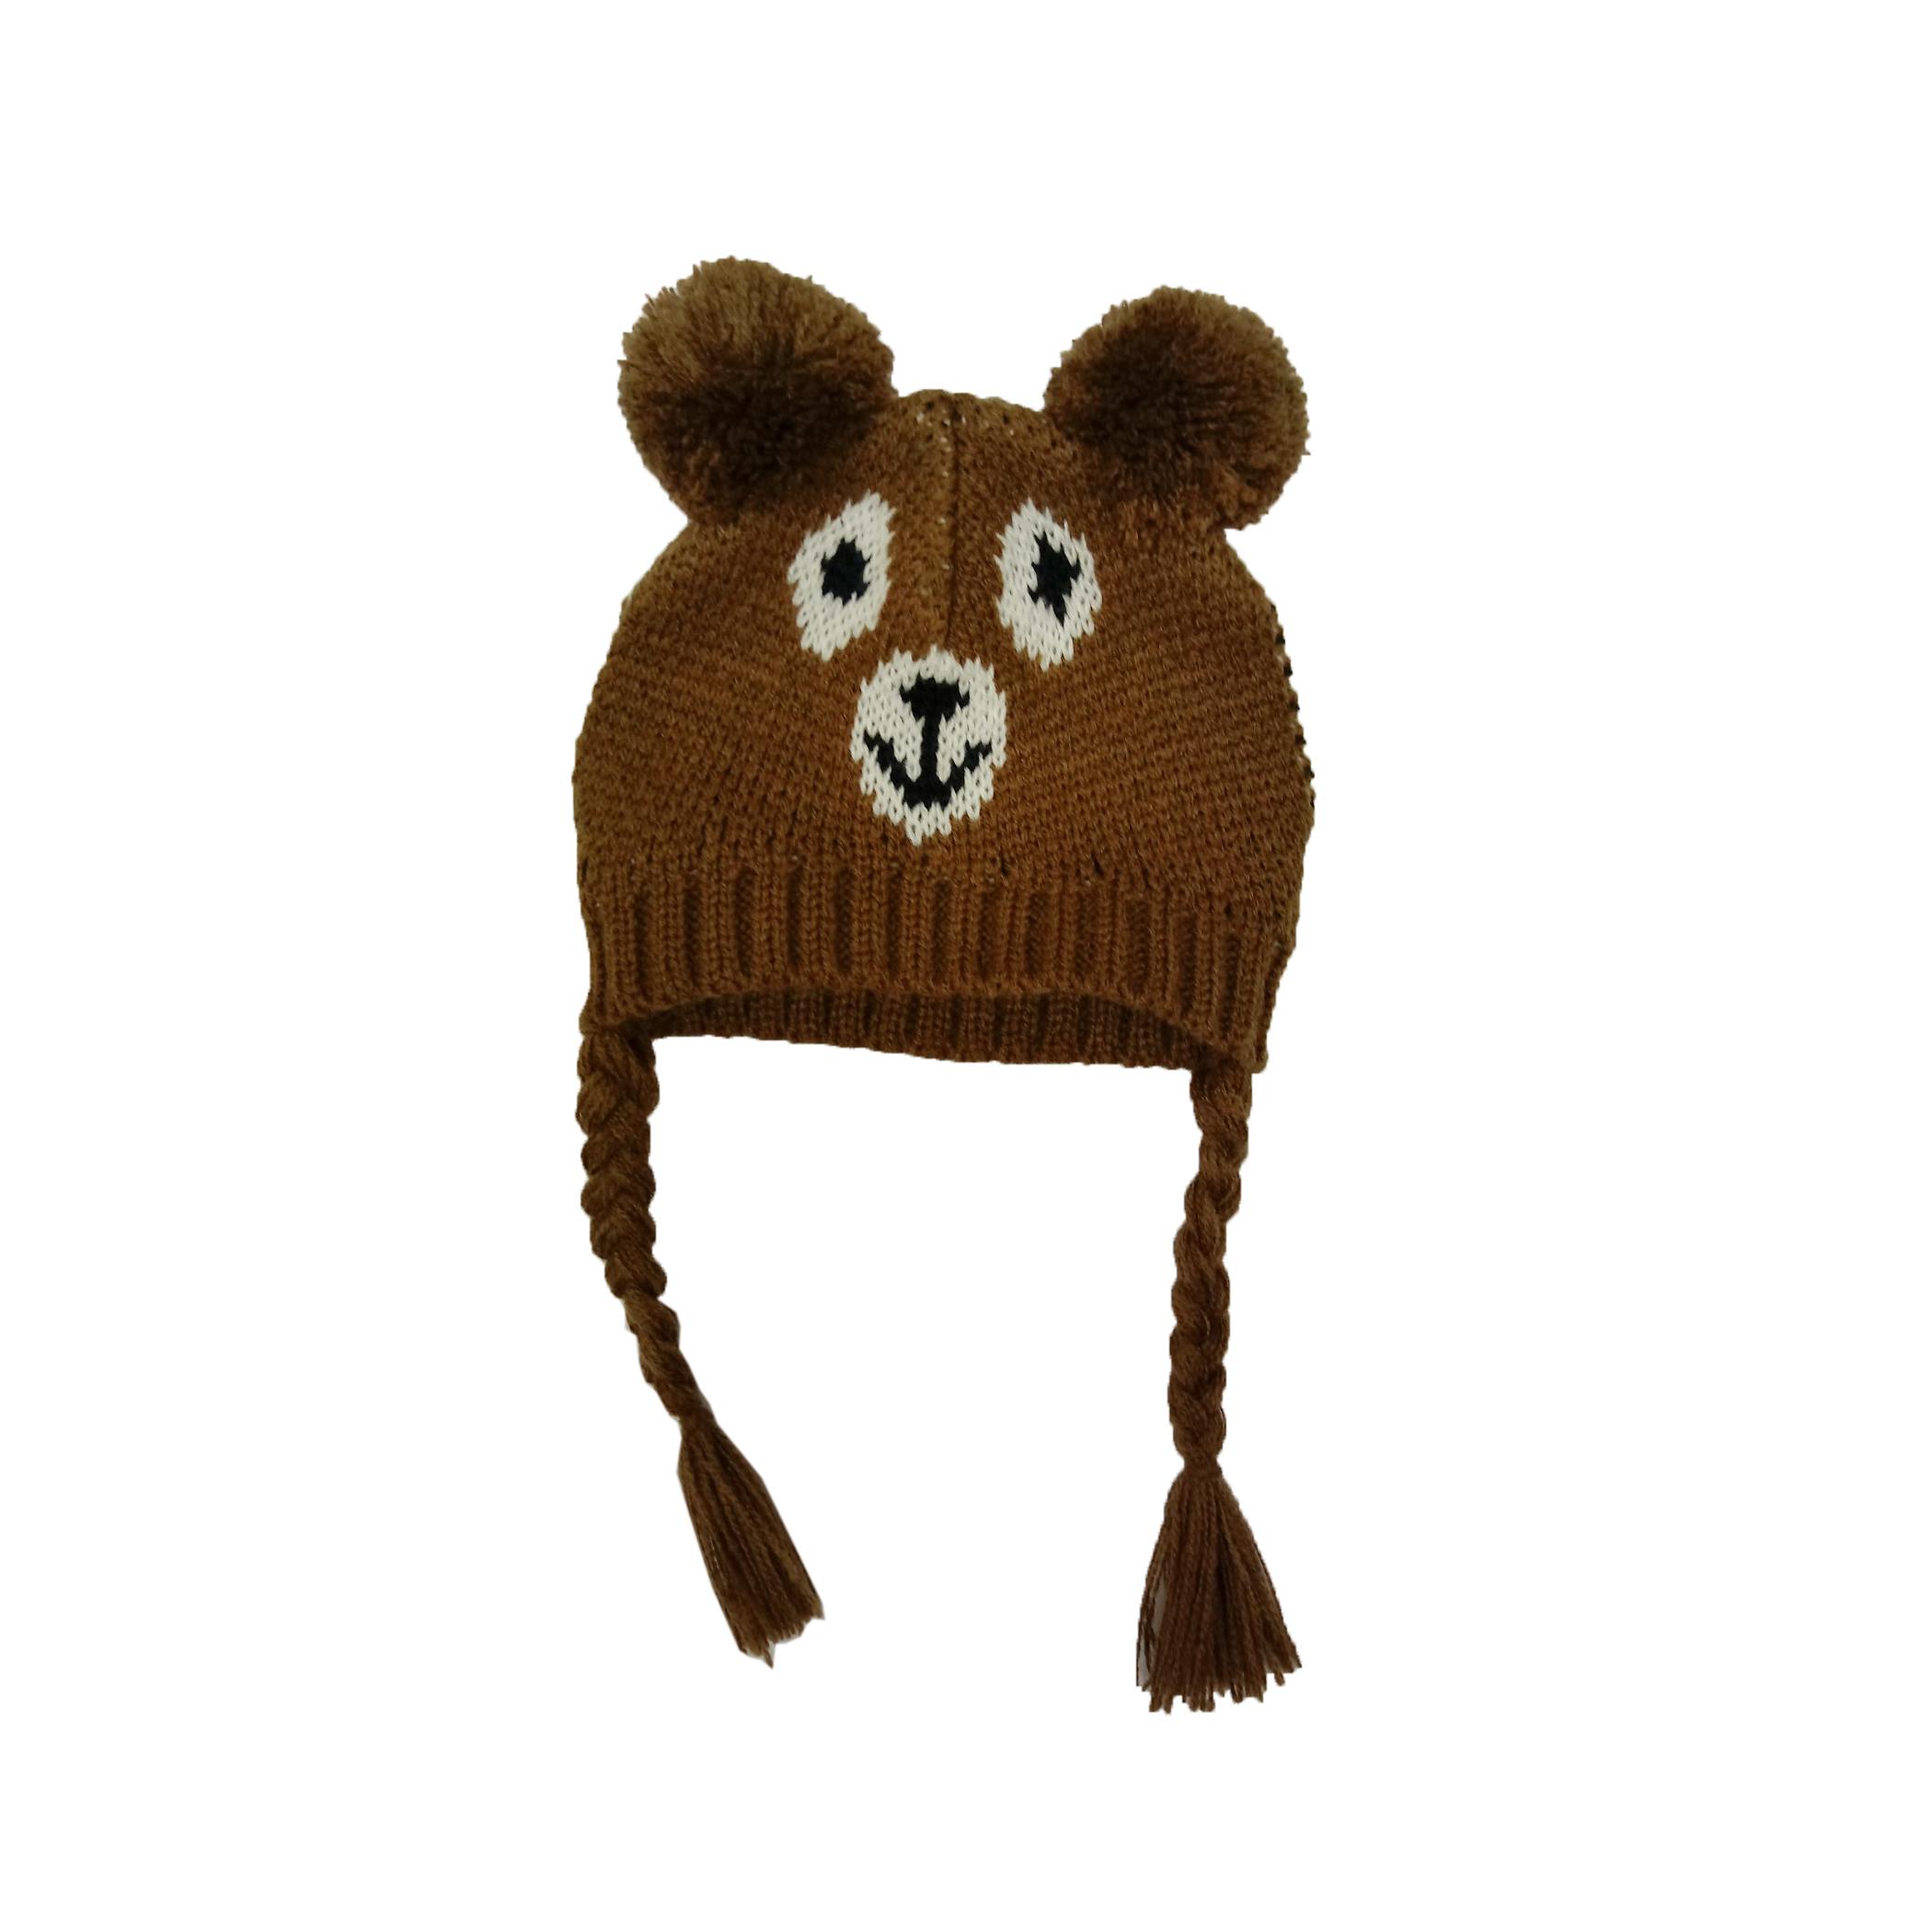 c08e0dcb0 Bear Hat - Ethical Pet